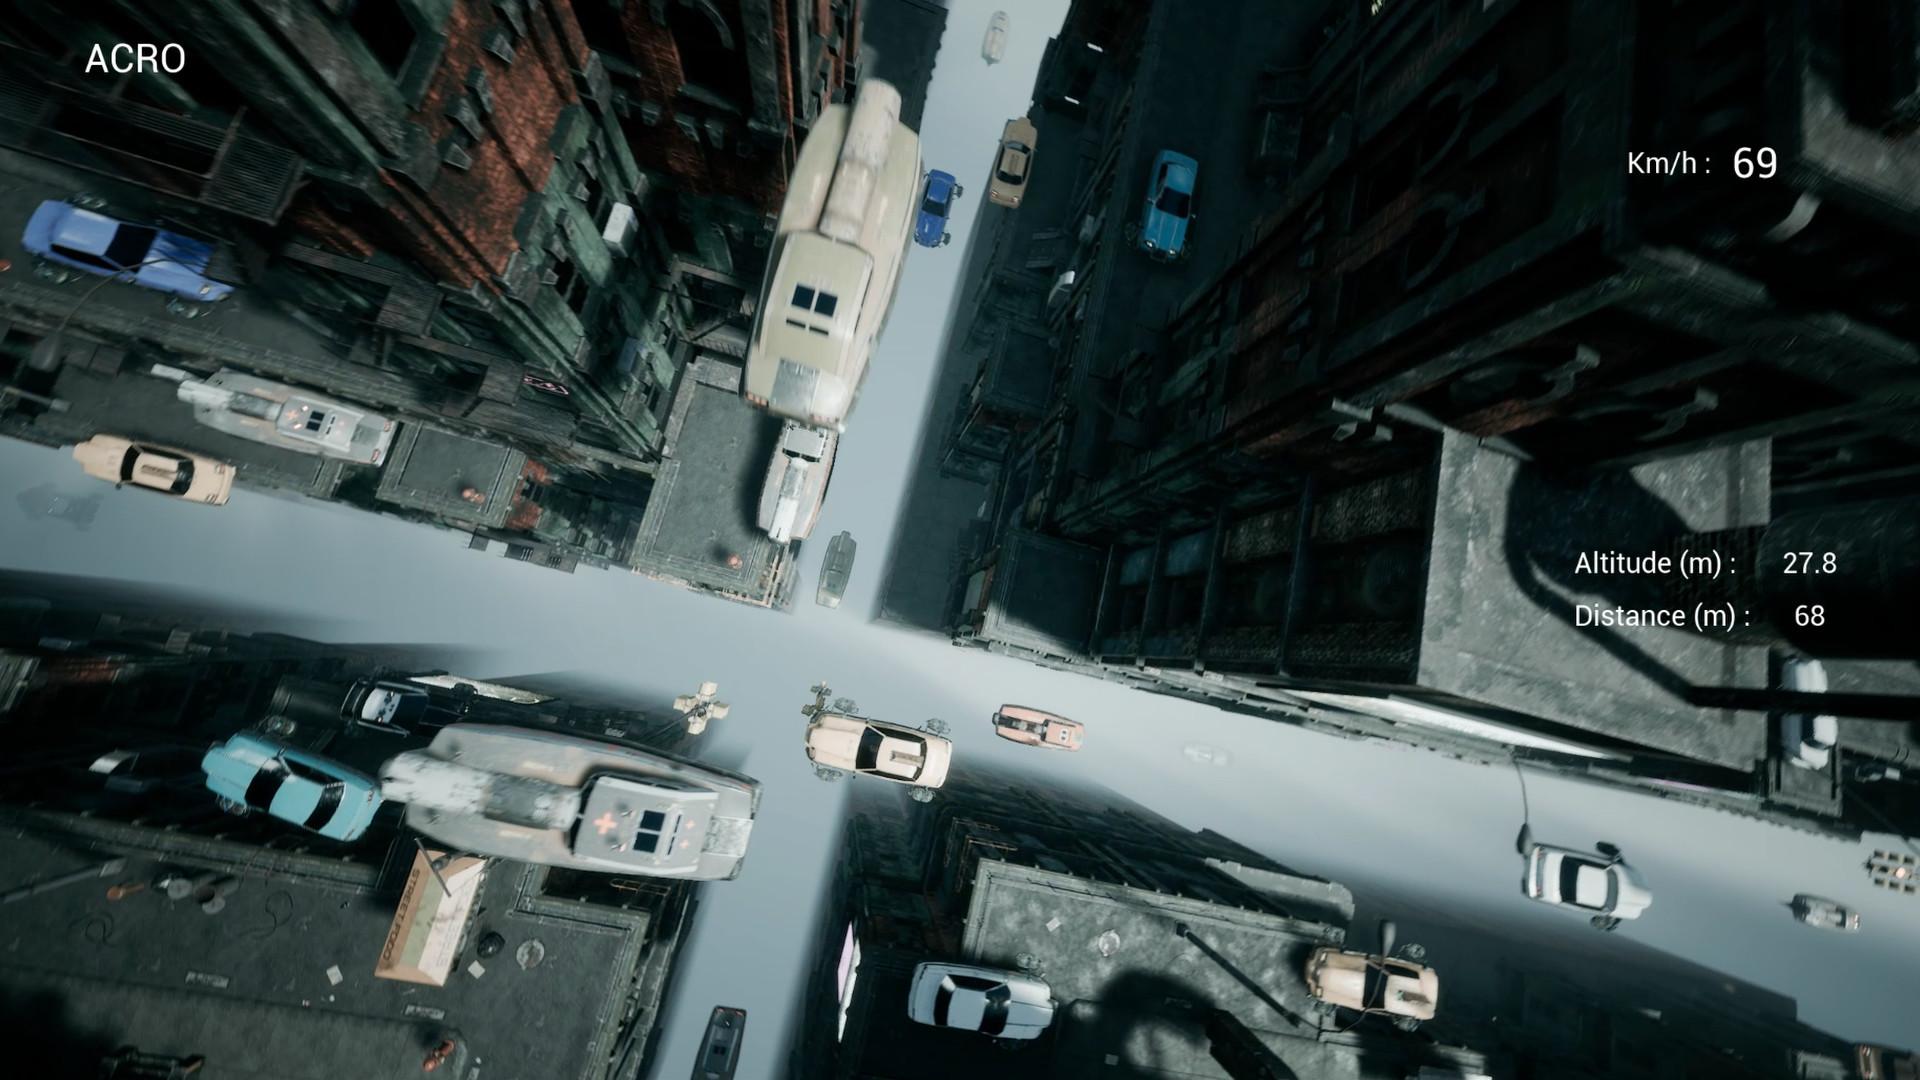 uncrashed-fpv-drone-simulator-pc-screenshot-3